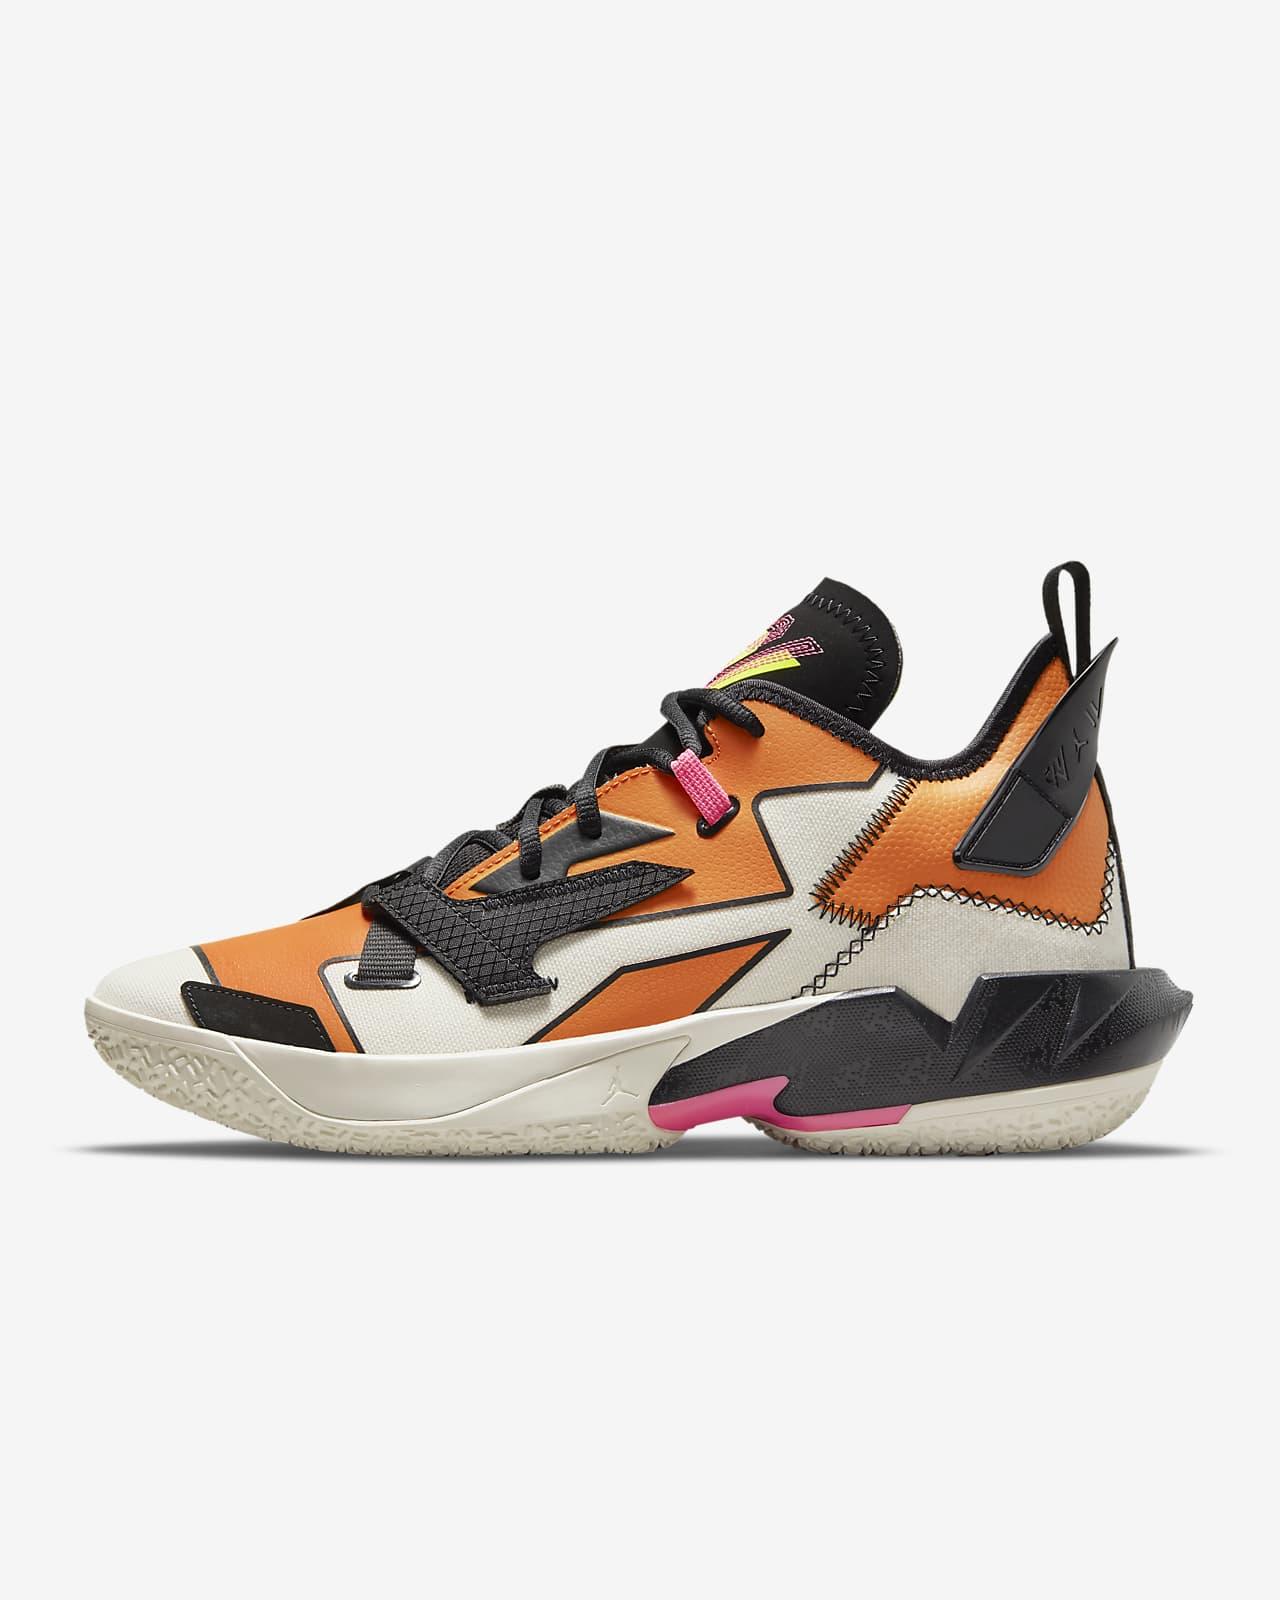 Jordan 'Why Not?' Zer0.4 Basketball Shoe